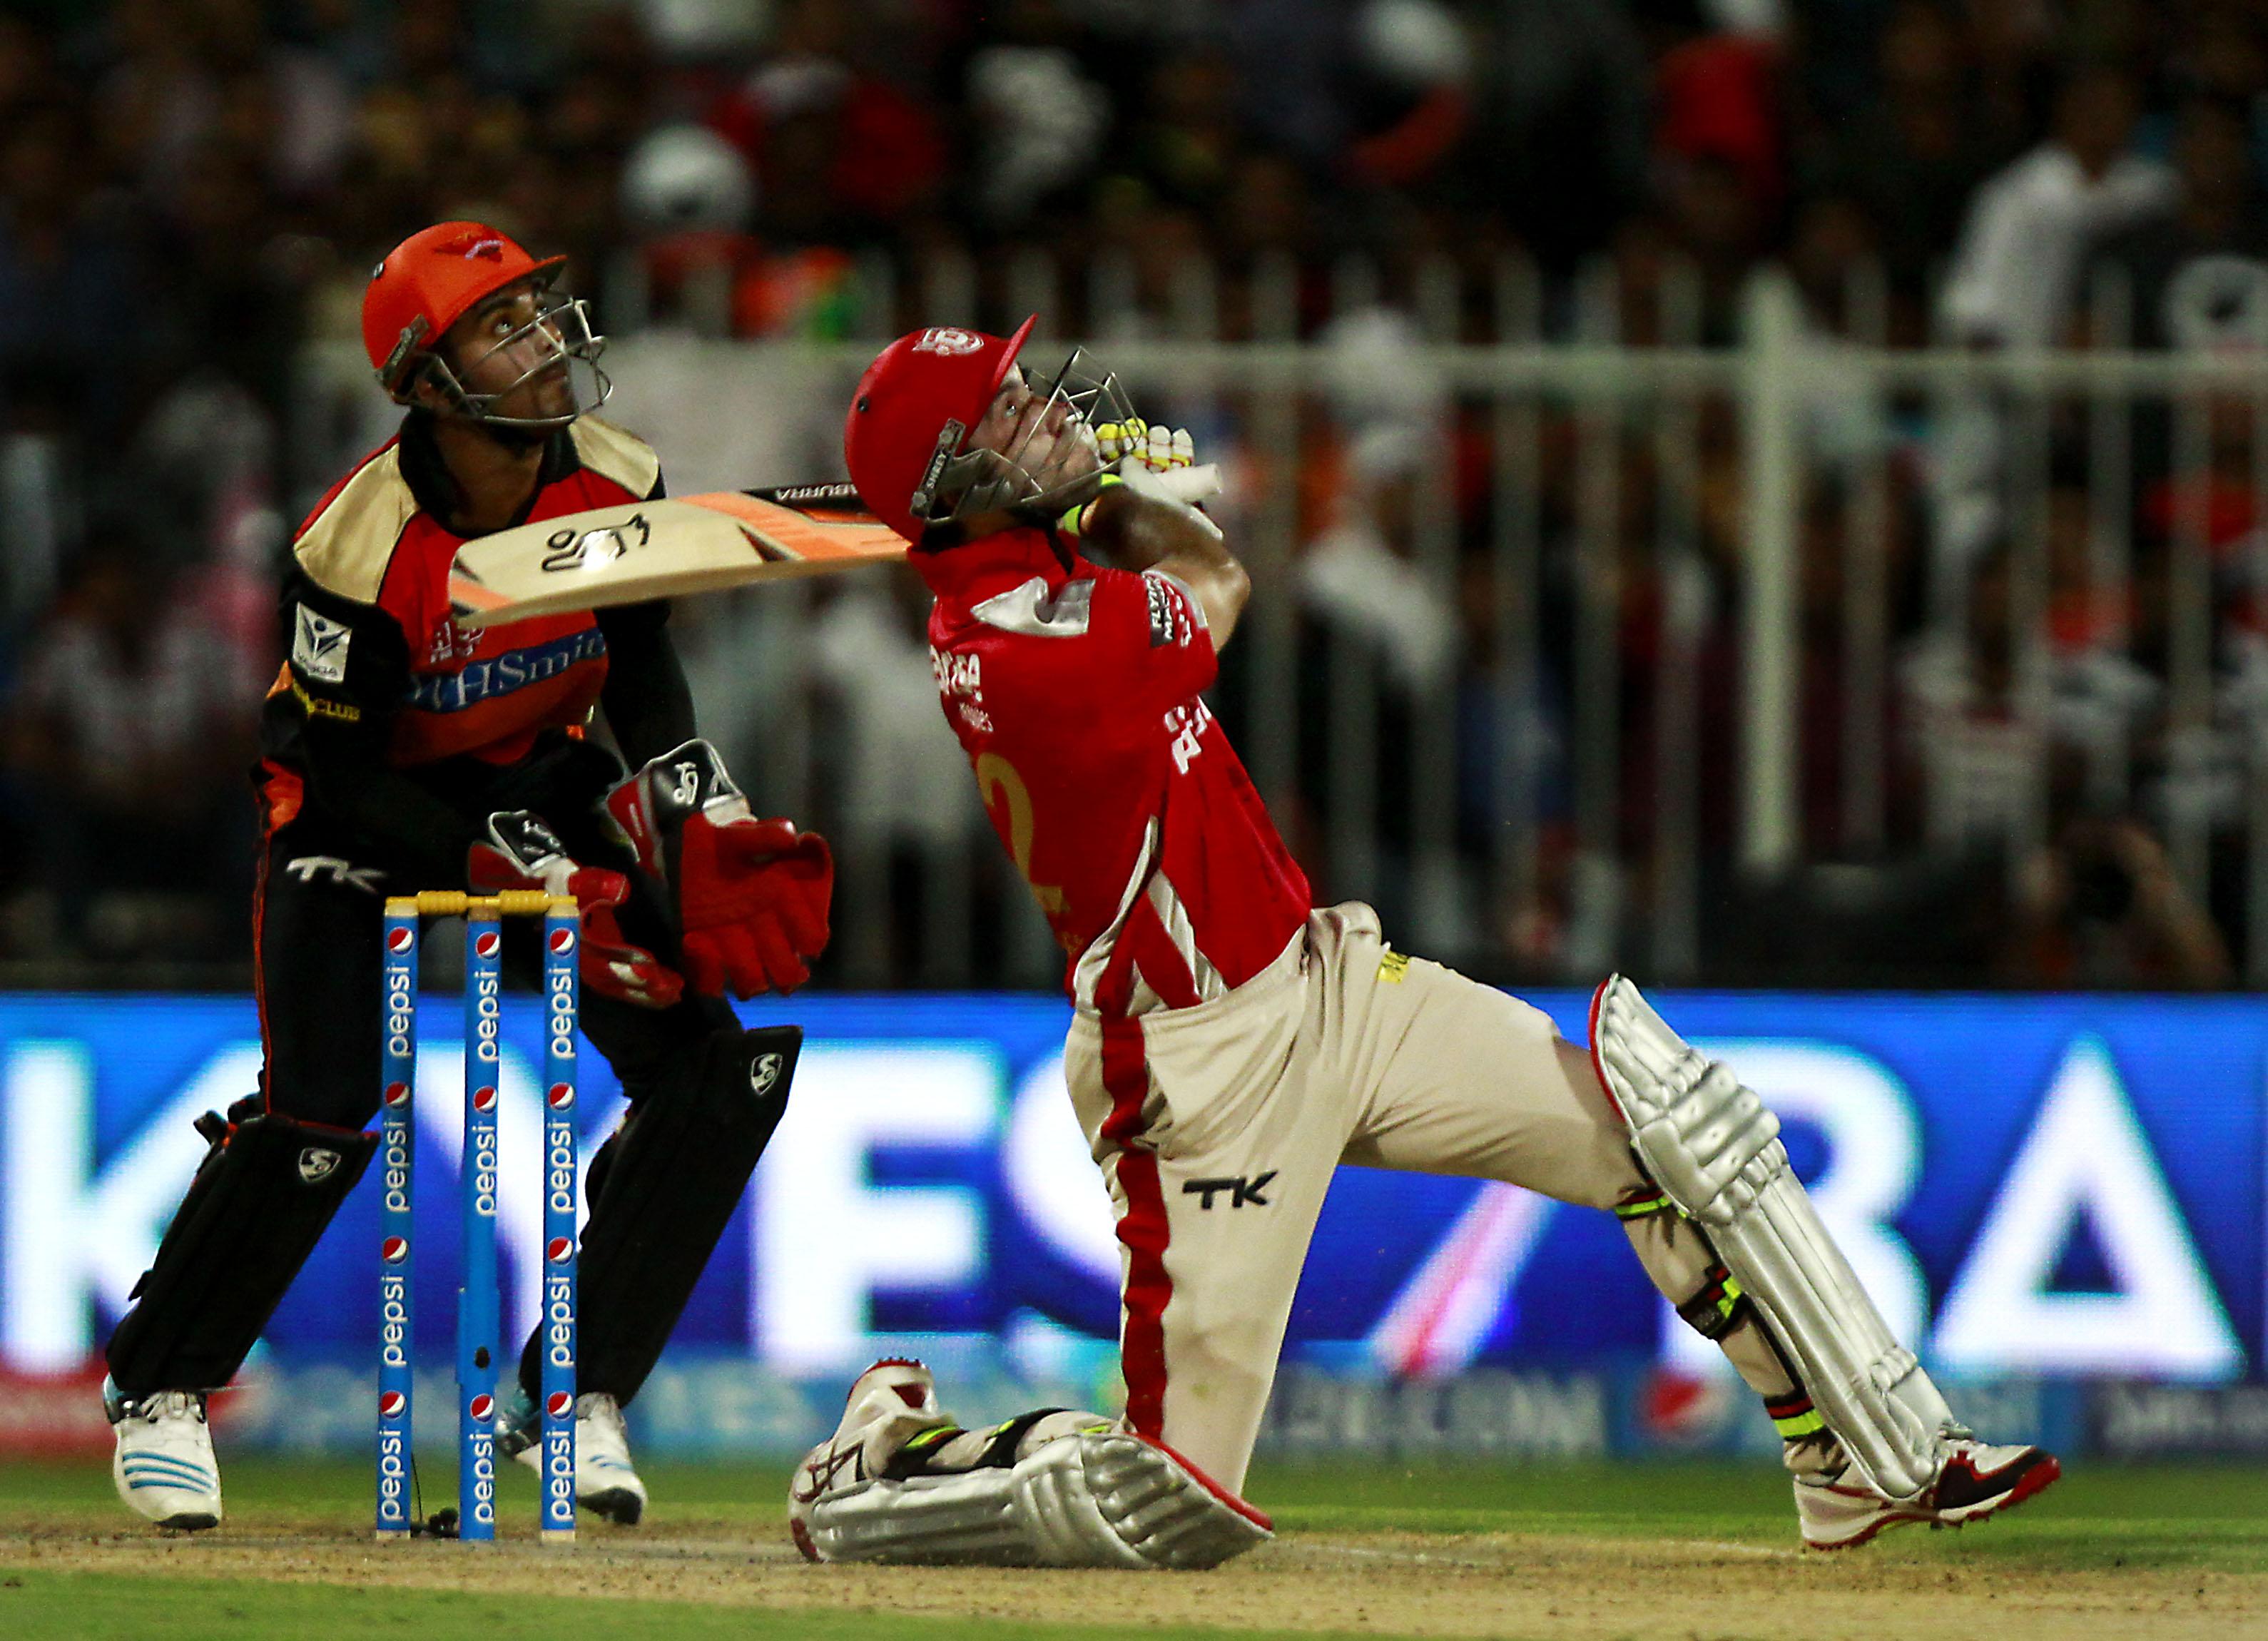 KXIP vs SRH, IPL 2014: Kings XI Punjab defeat Sunrisers Hyderabad by 72 runs